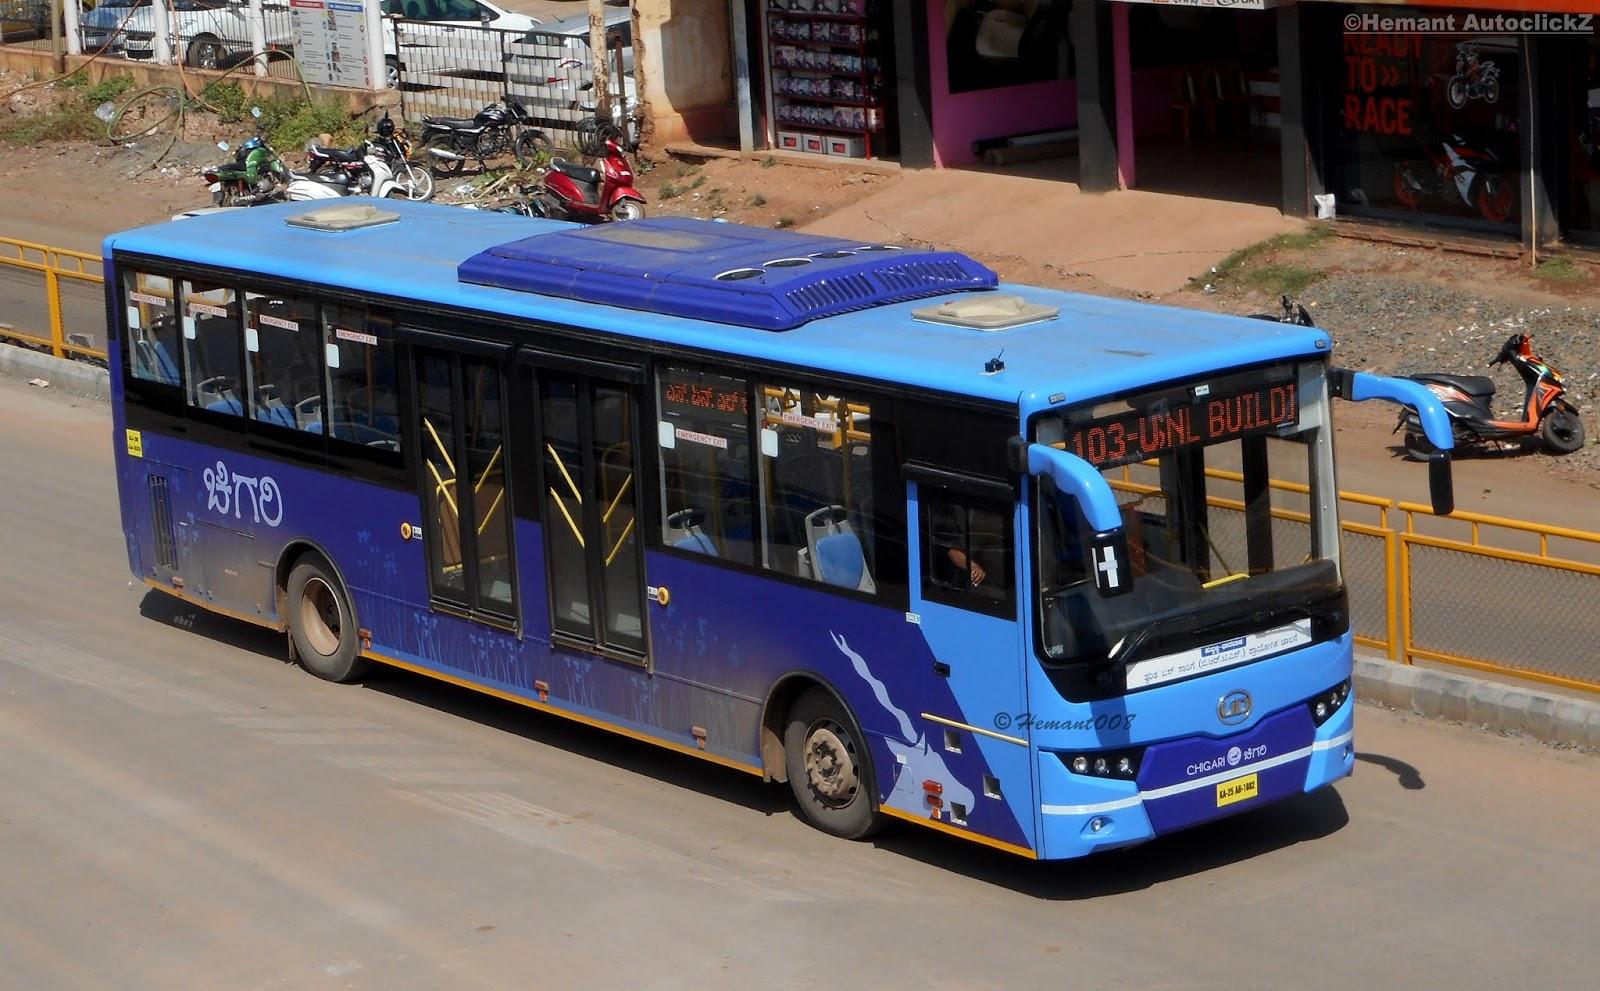 hemant autoclickz : hubli-dharwad bus rapid transit system - volvo